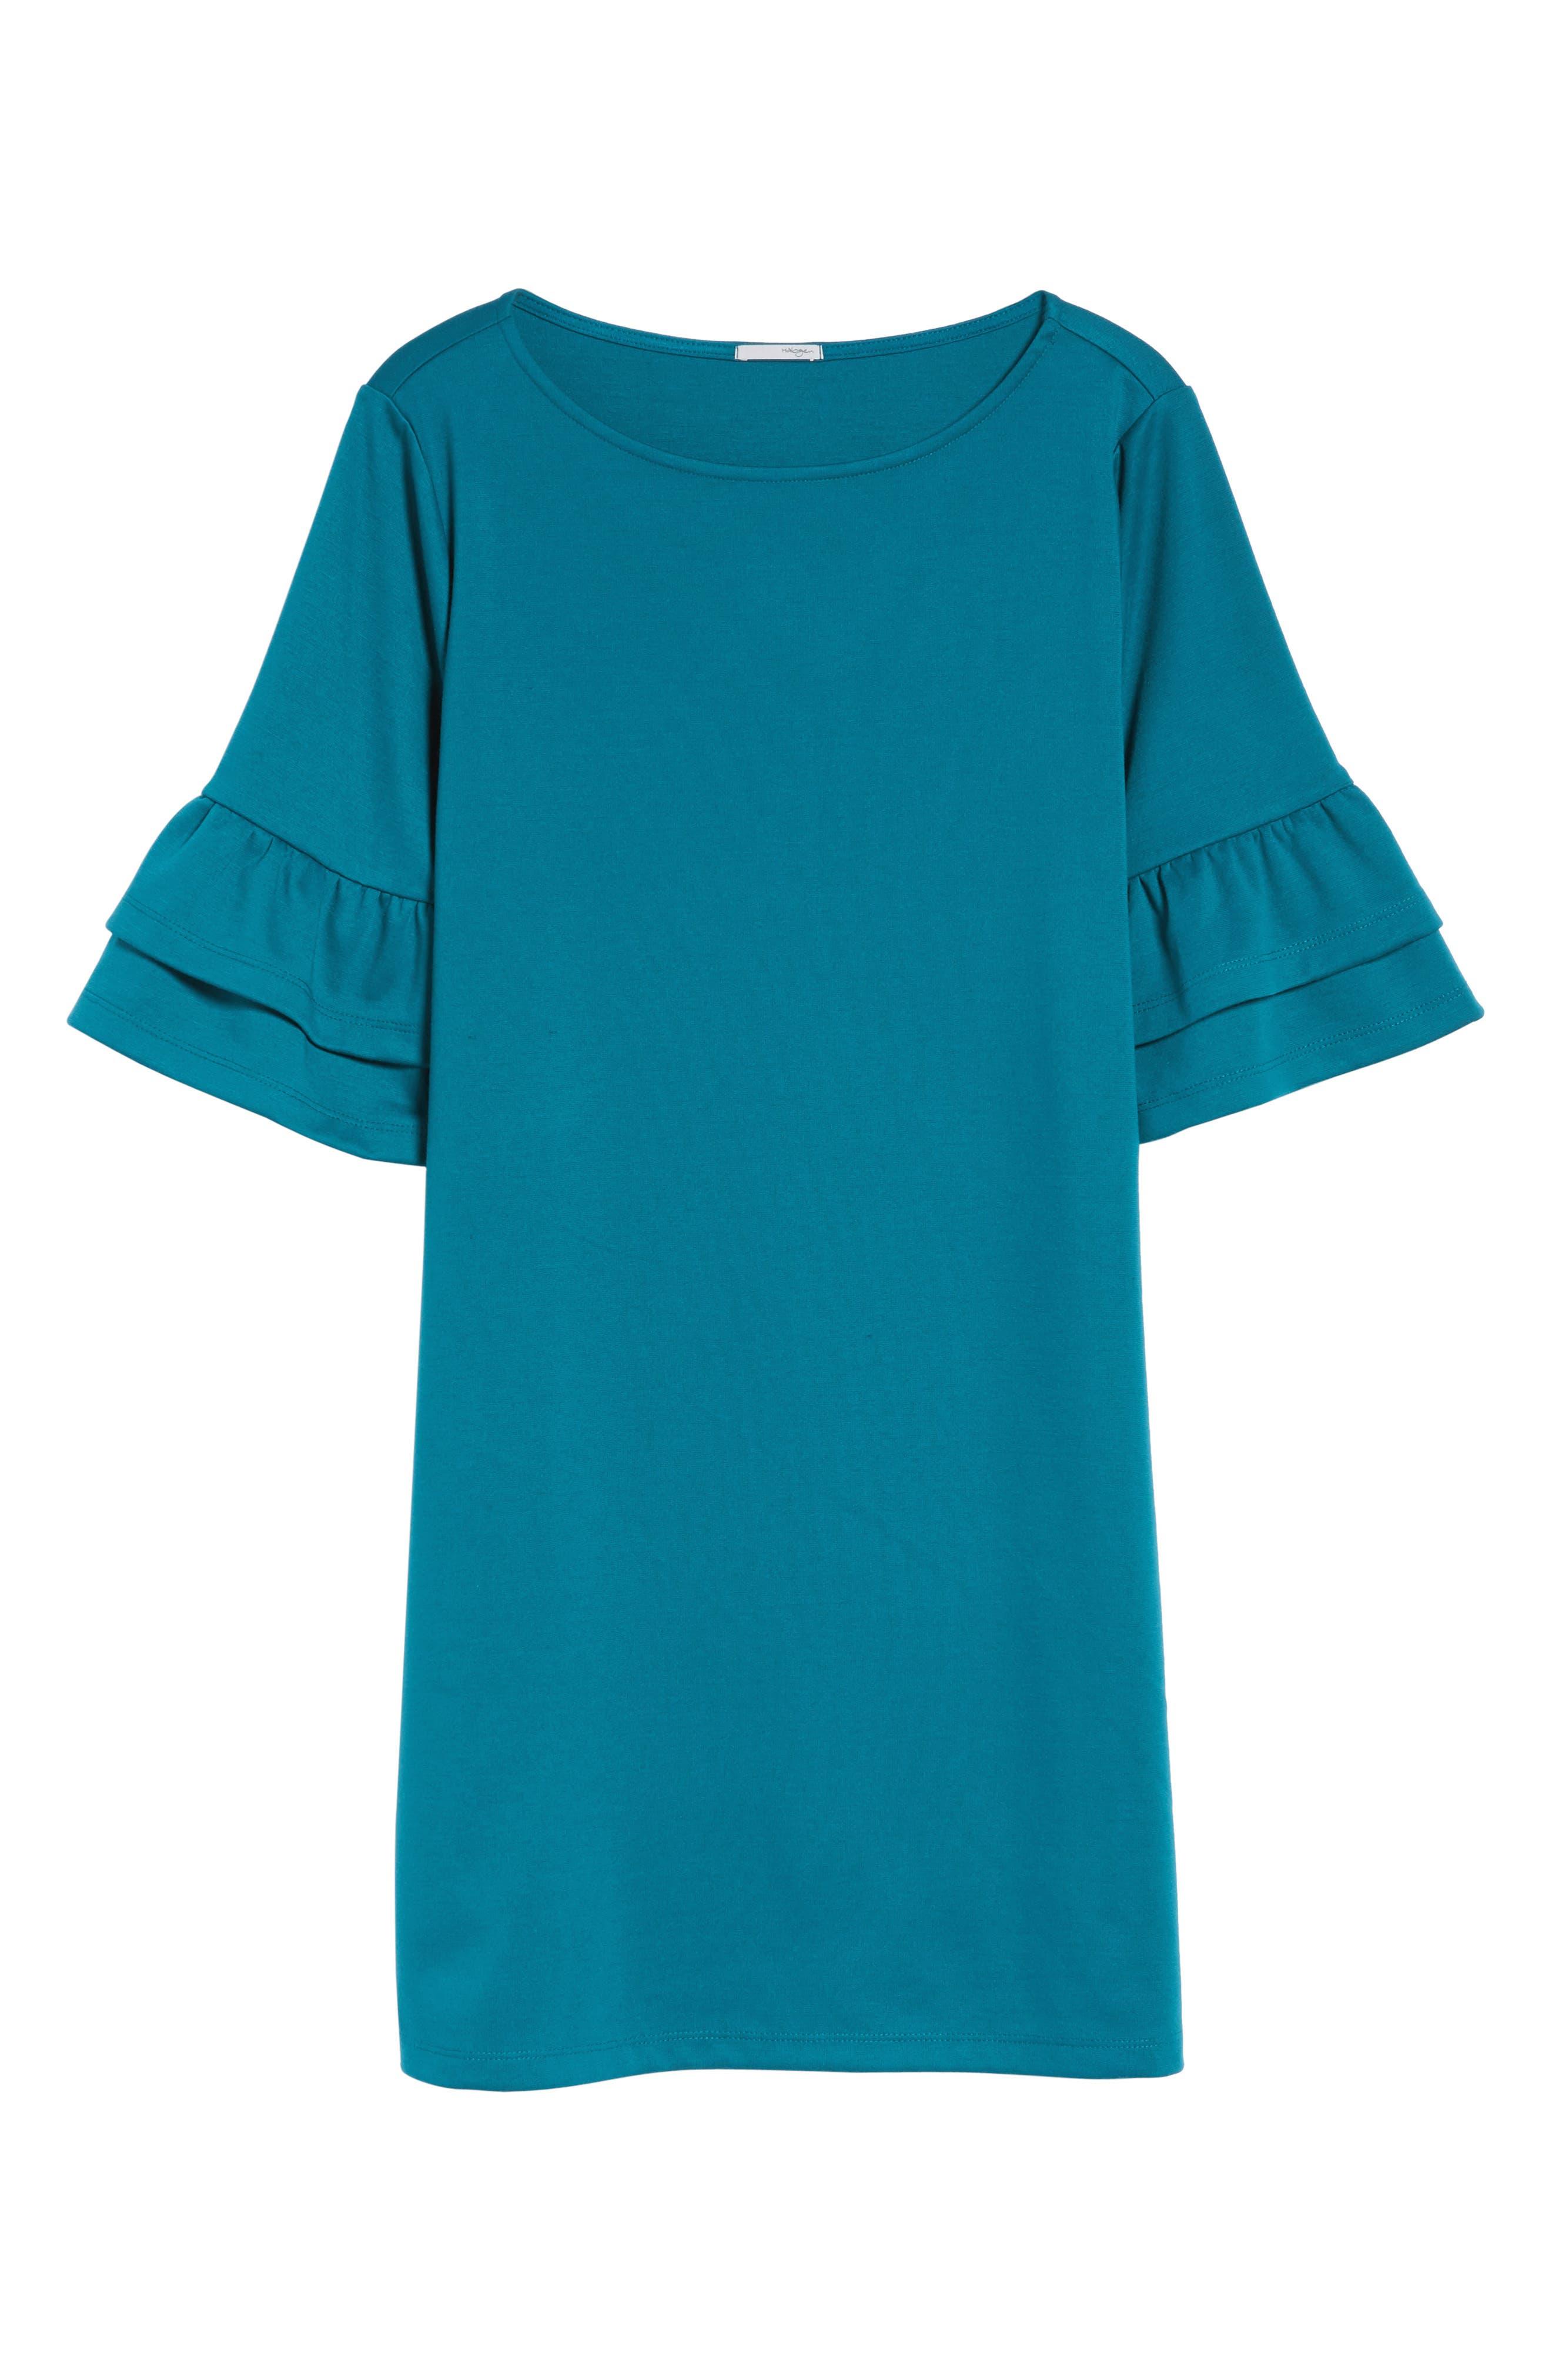 Ruffle Sleeve Shift Dress,                             Alternate thumbnail 6, color,                             Teal